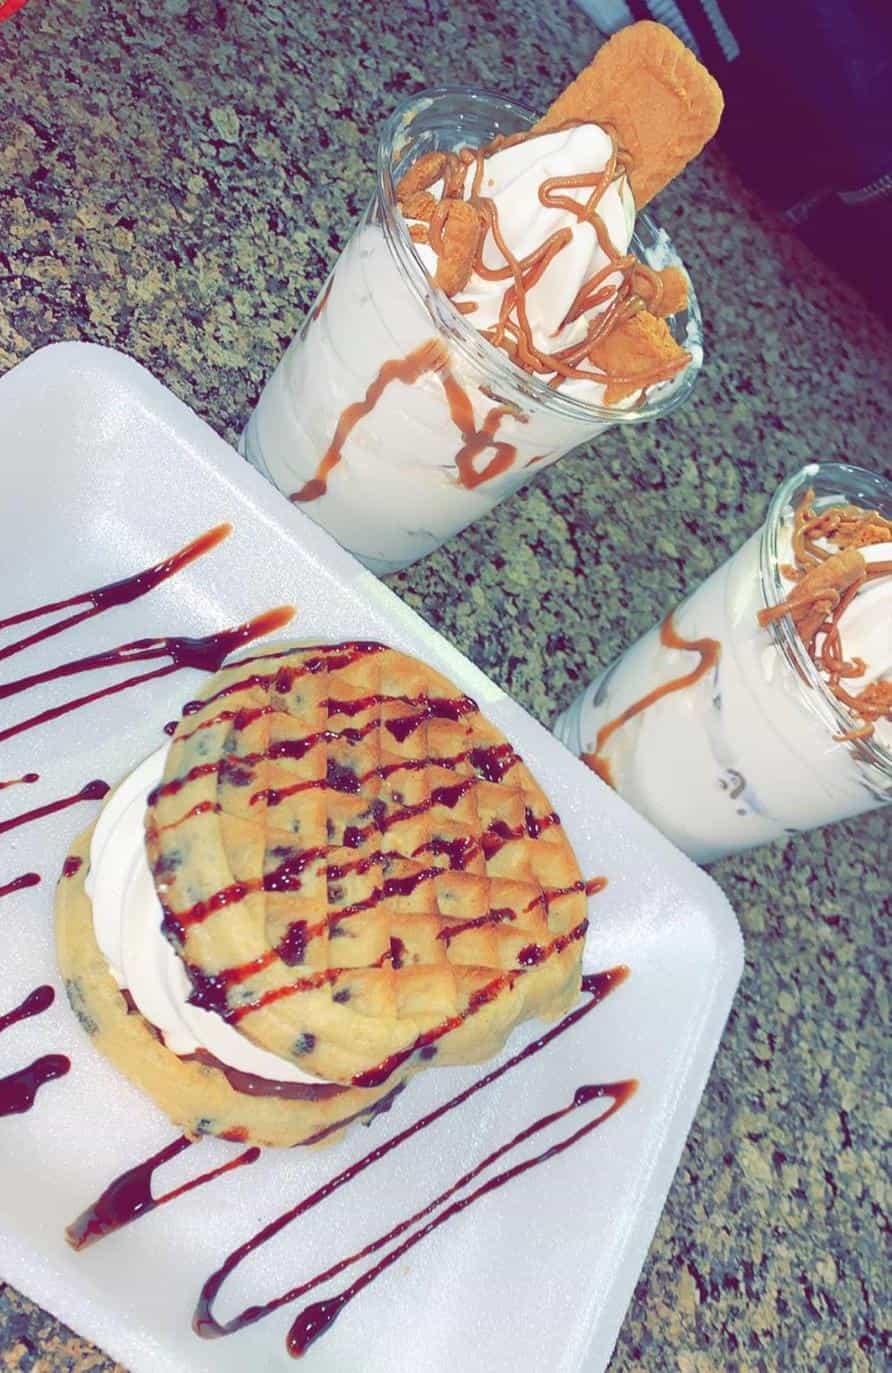 Ice cream sandwich and shakes